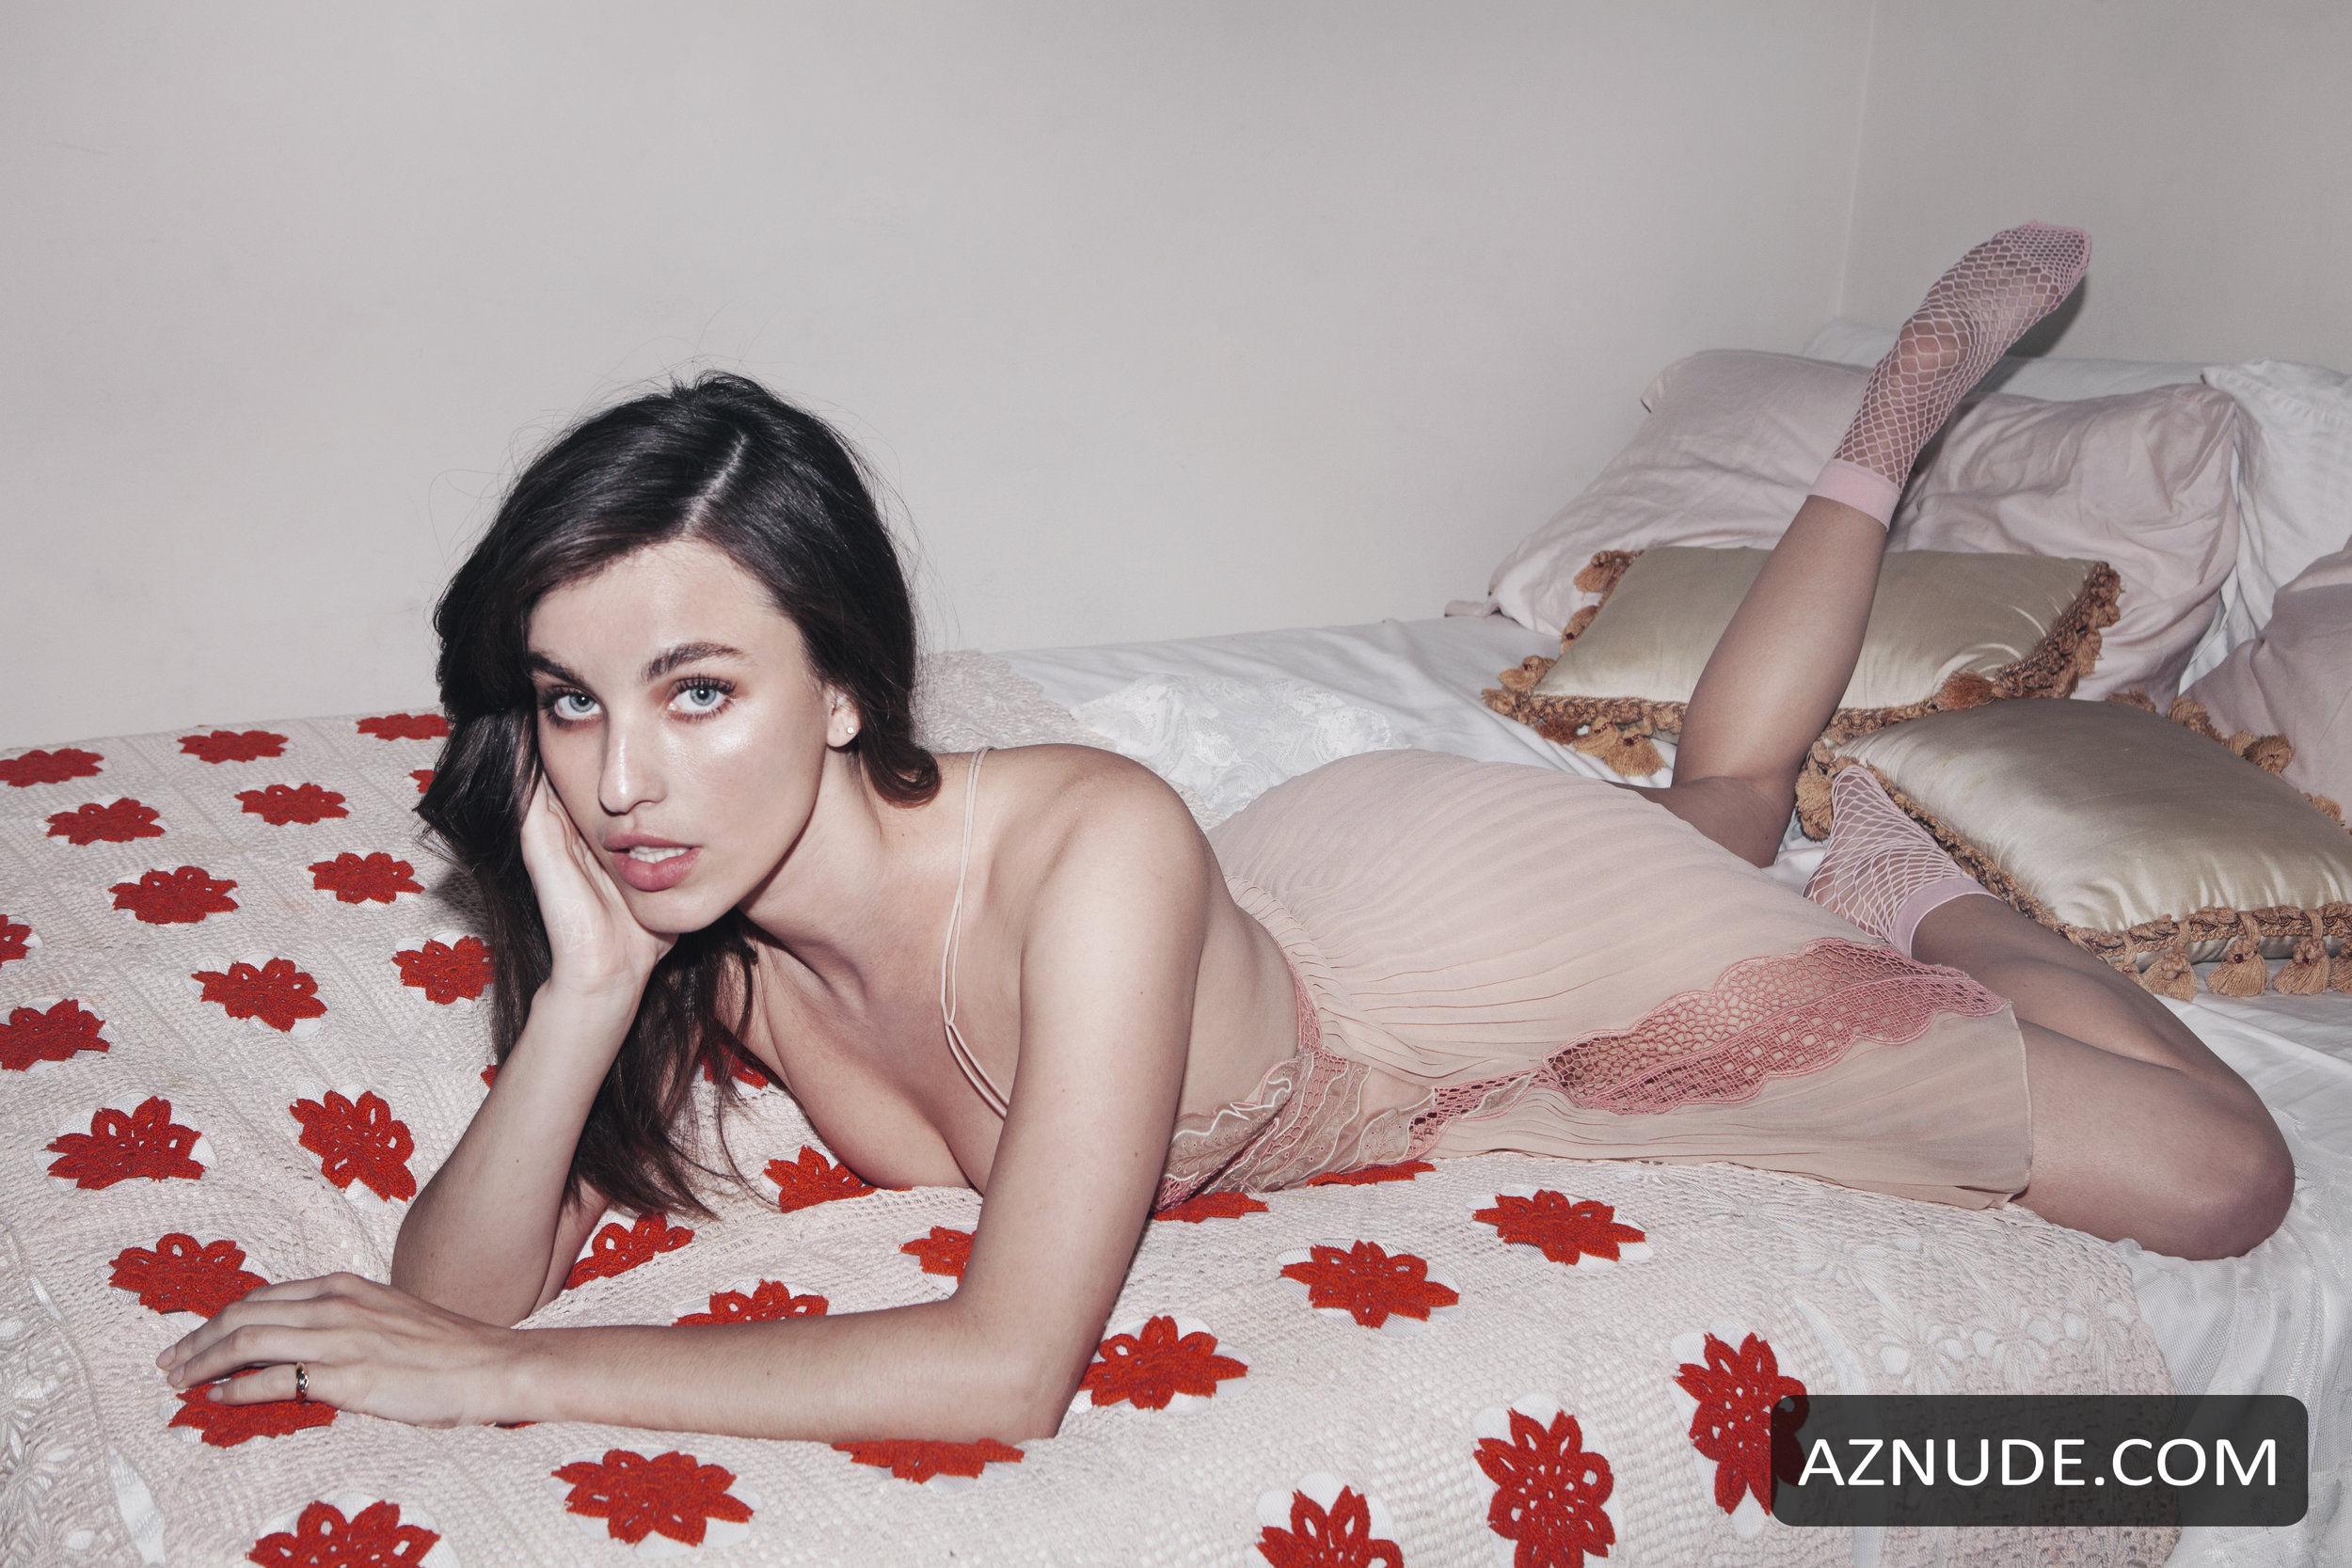 Rainey qualley nude